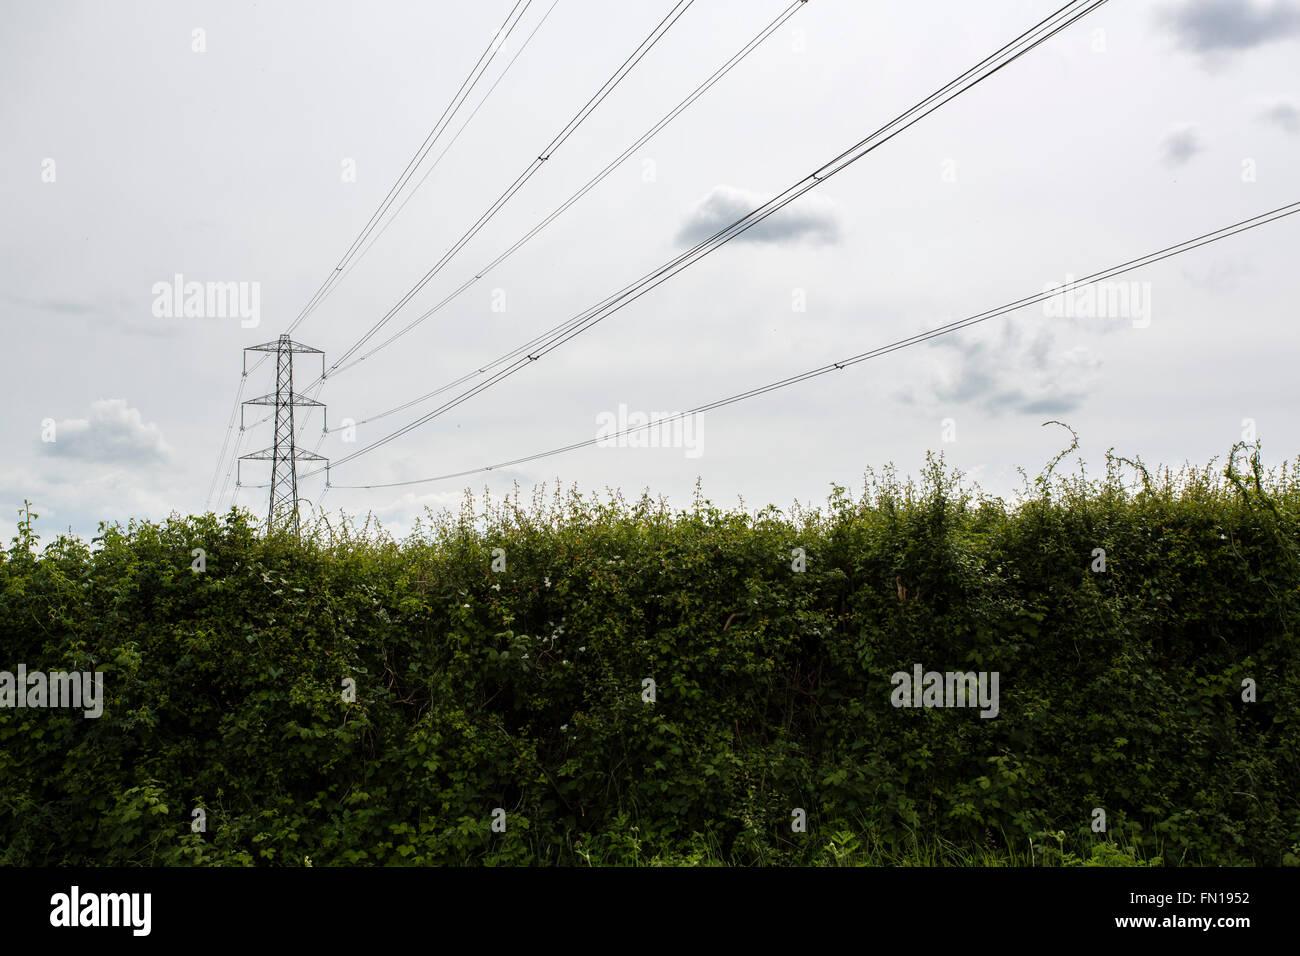 Local Power Distribution Stock Photos Amp Local Power